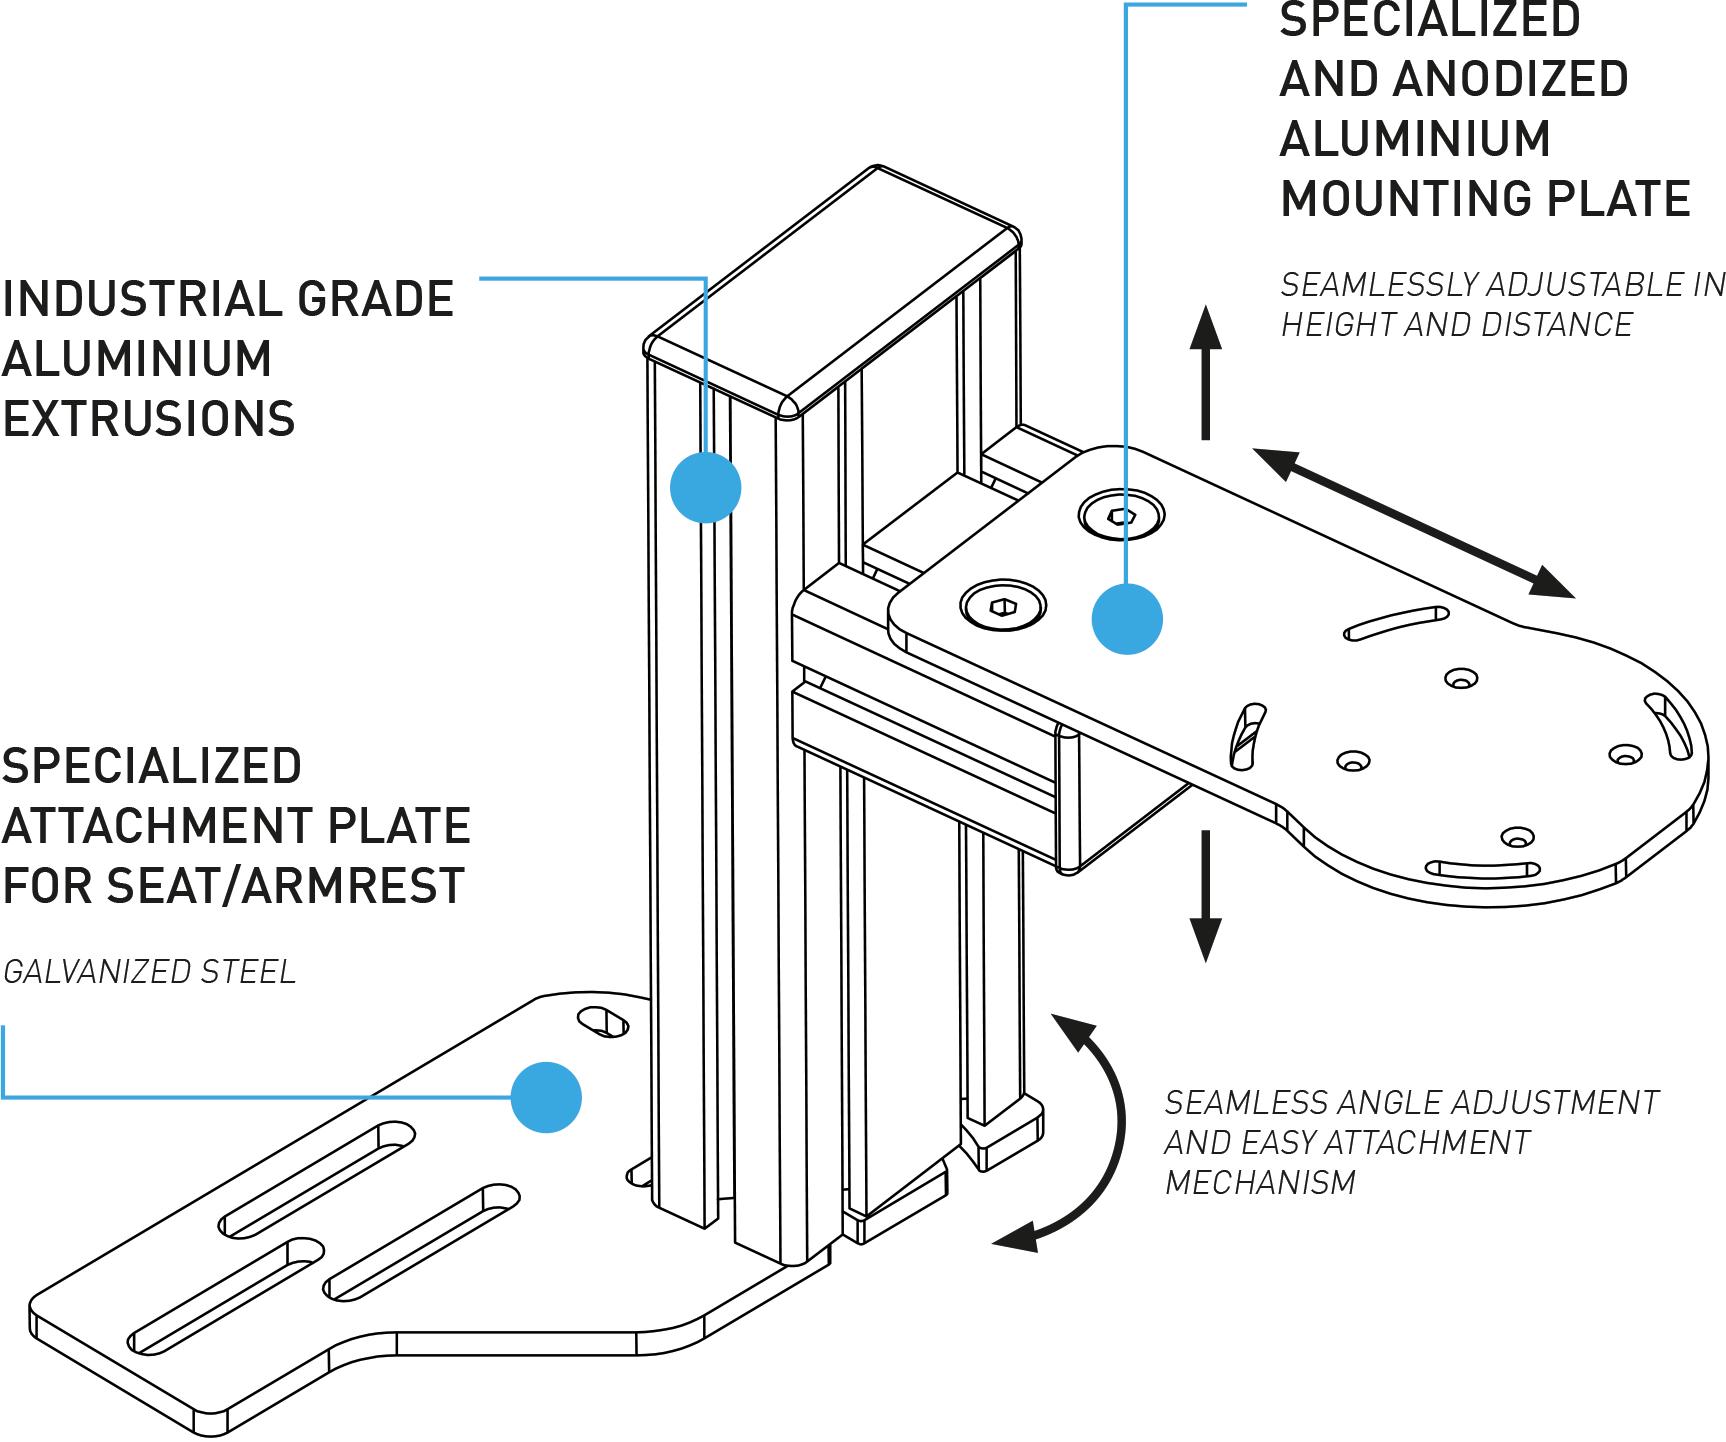 Joystick / HOTAS Chair Mount